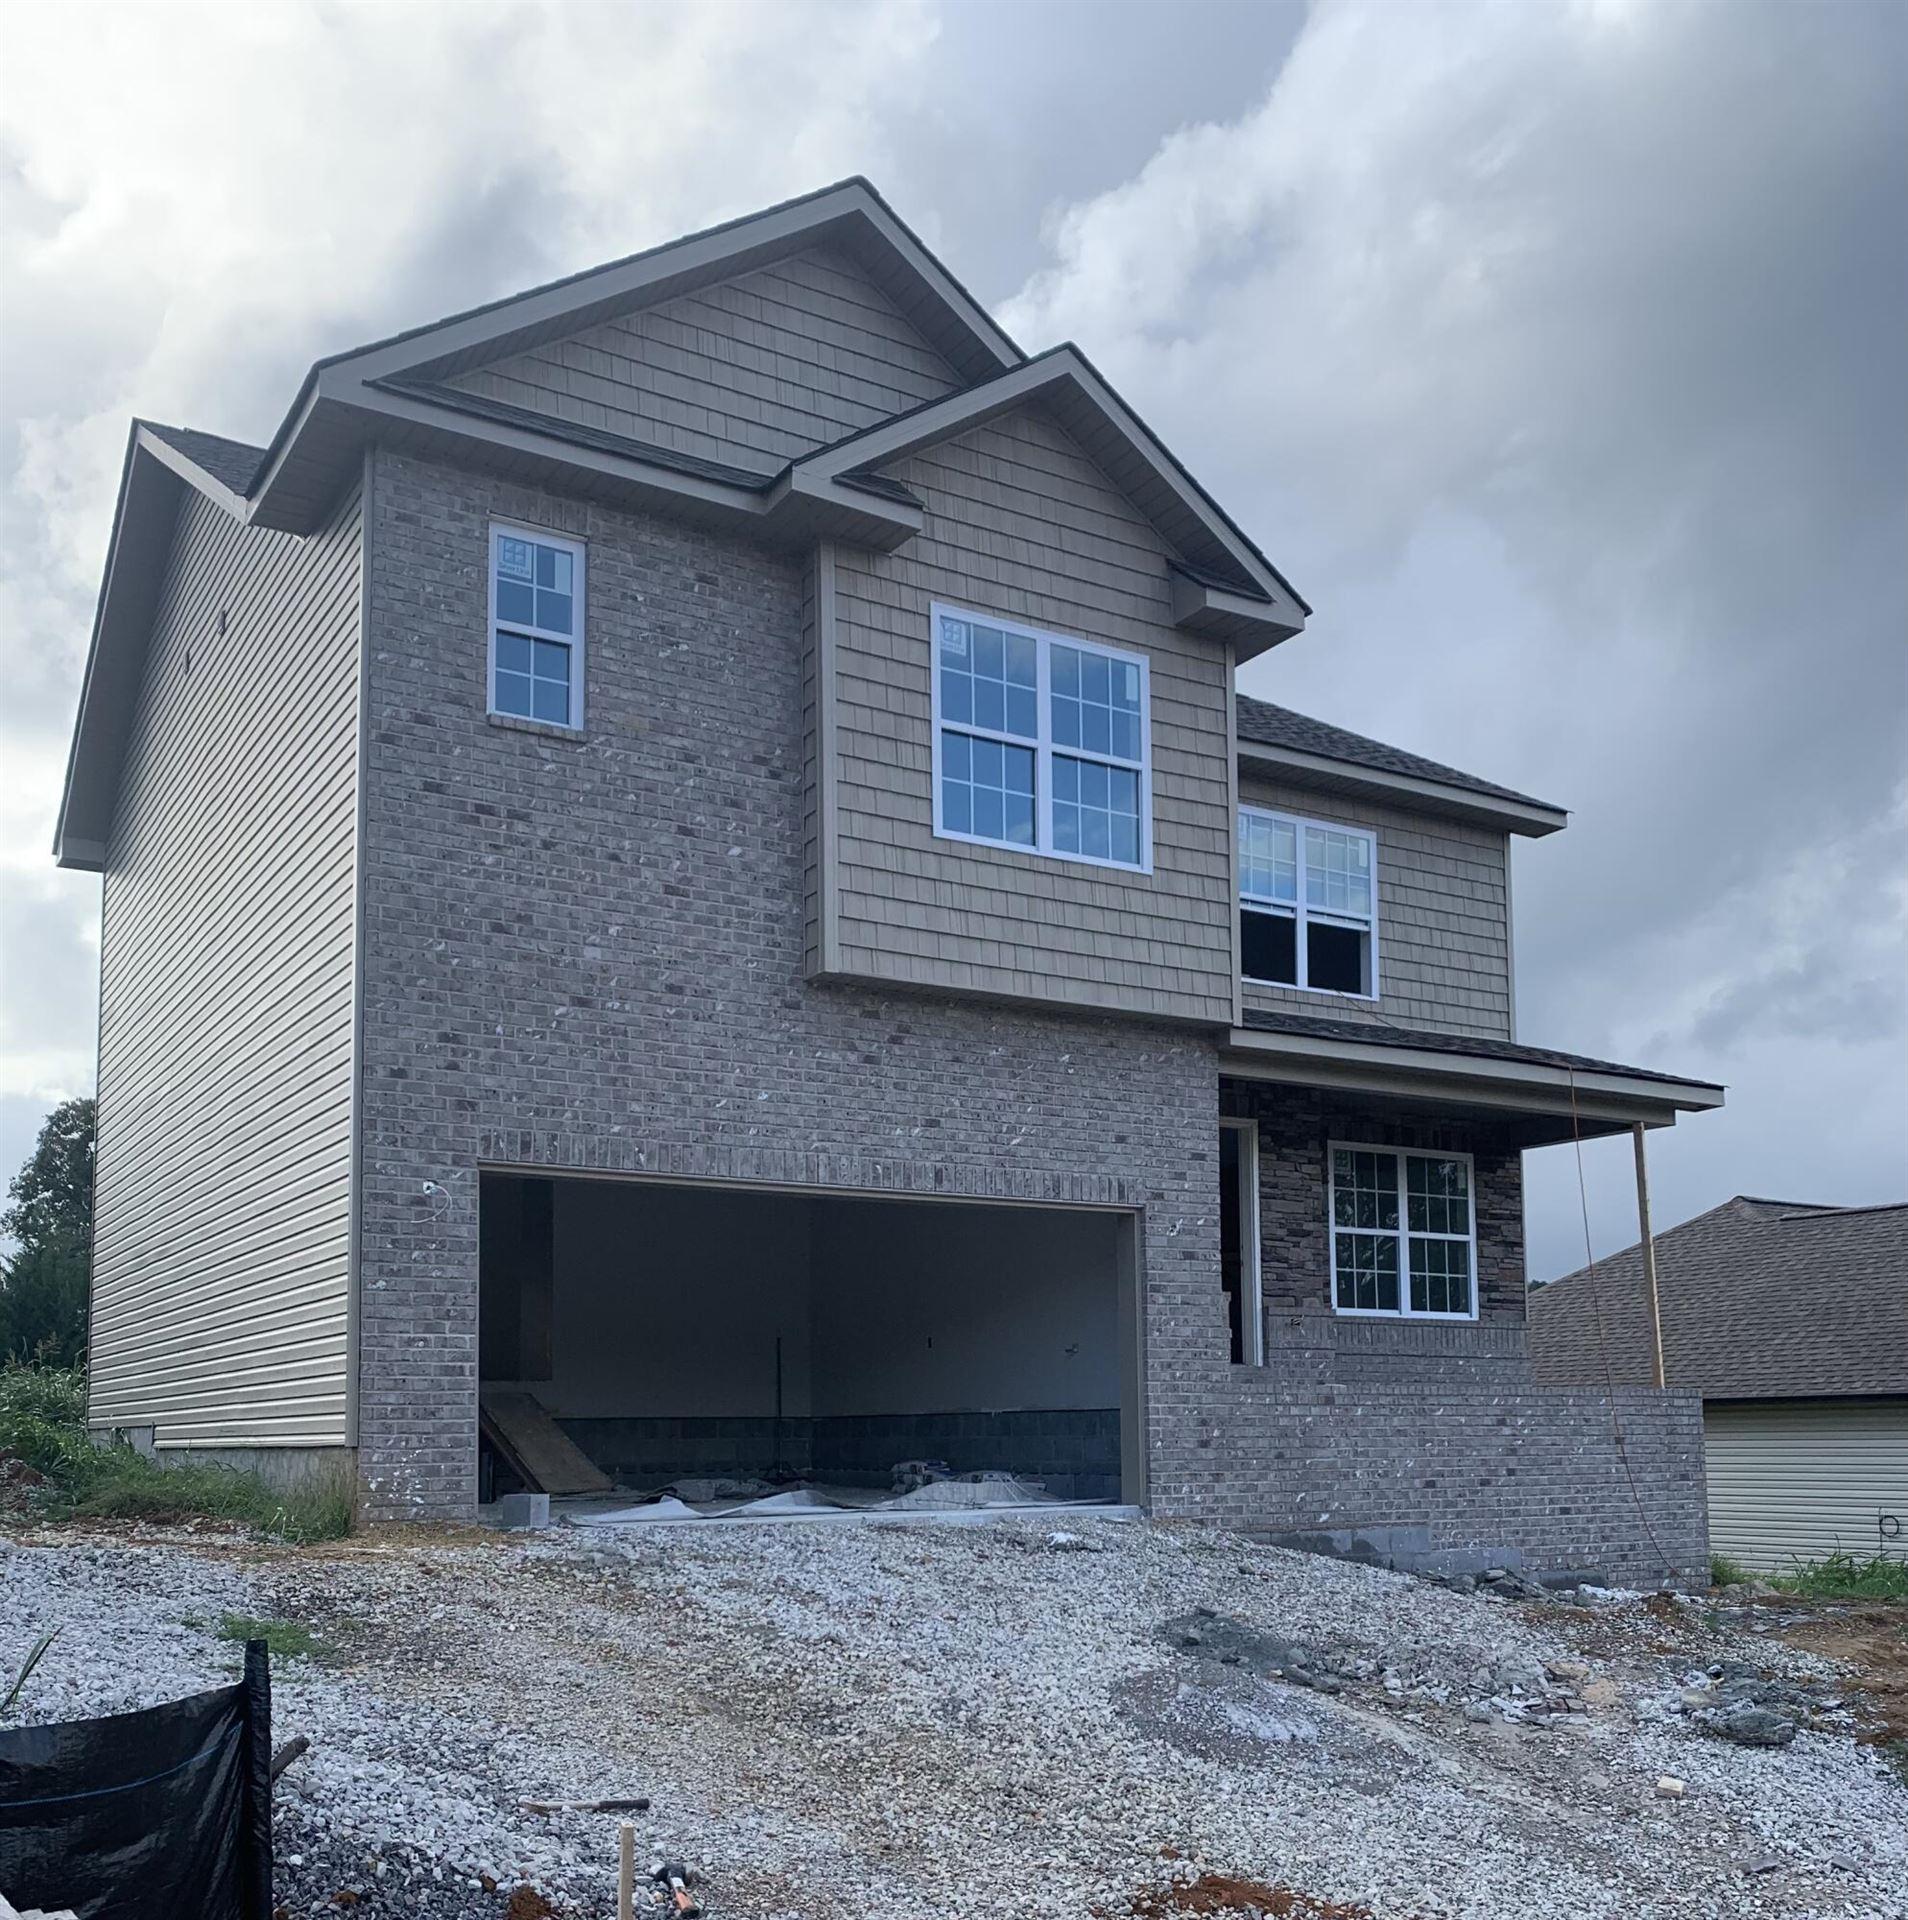 Photo of 5714 Autumn Creek Drive, Knoxville, TN 37924 (MLS # 1168495)